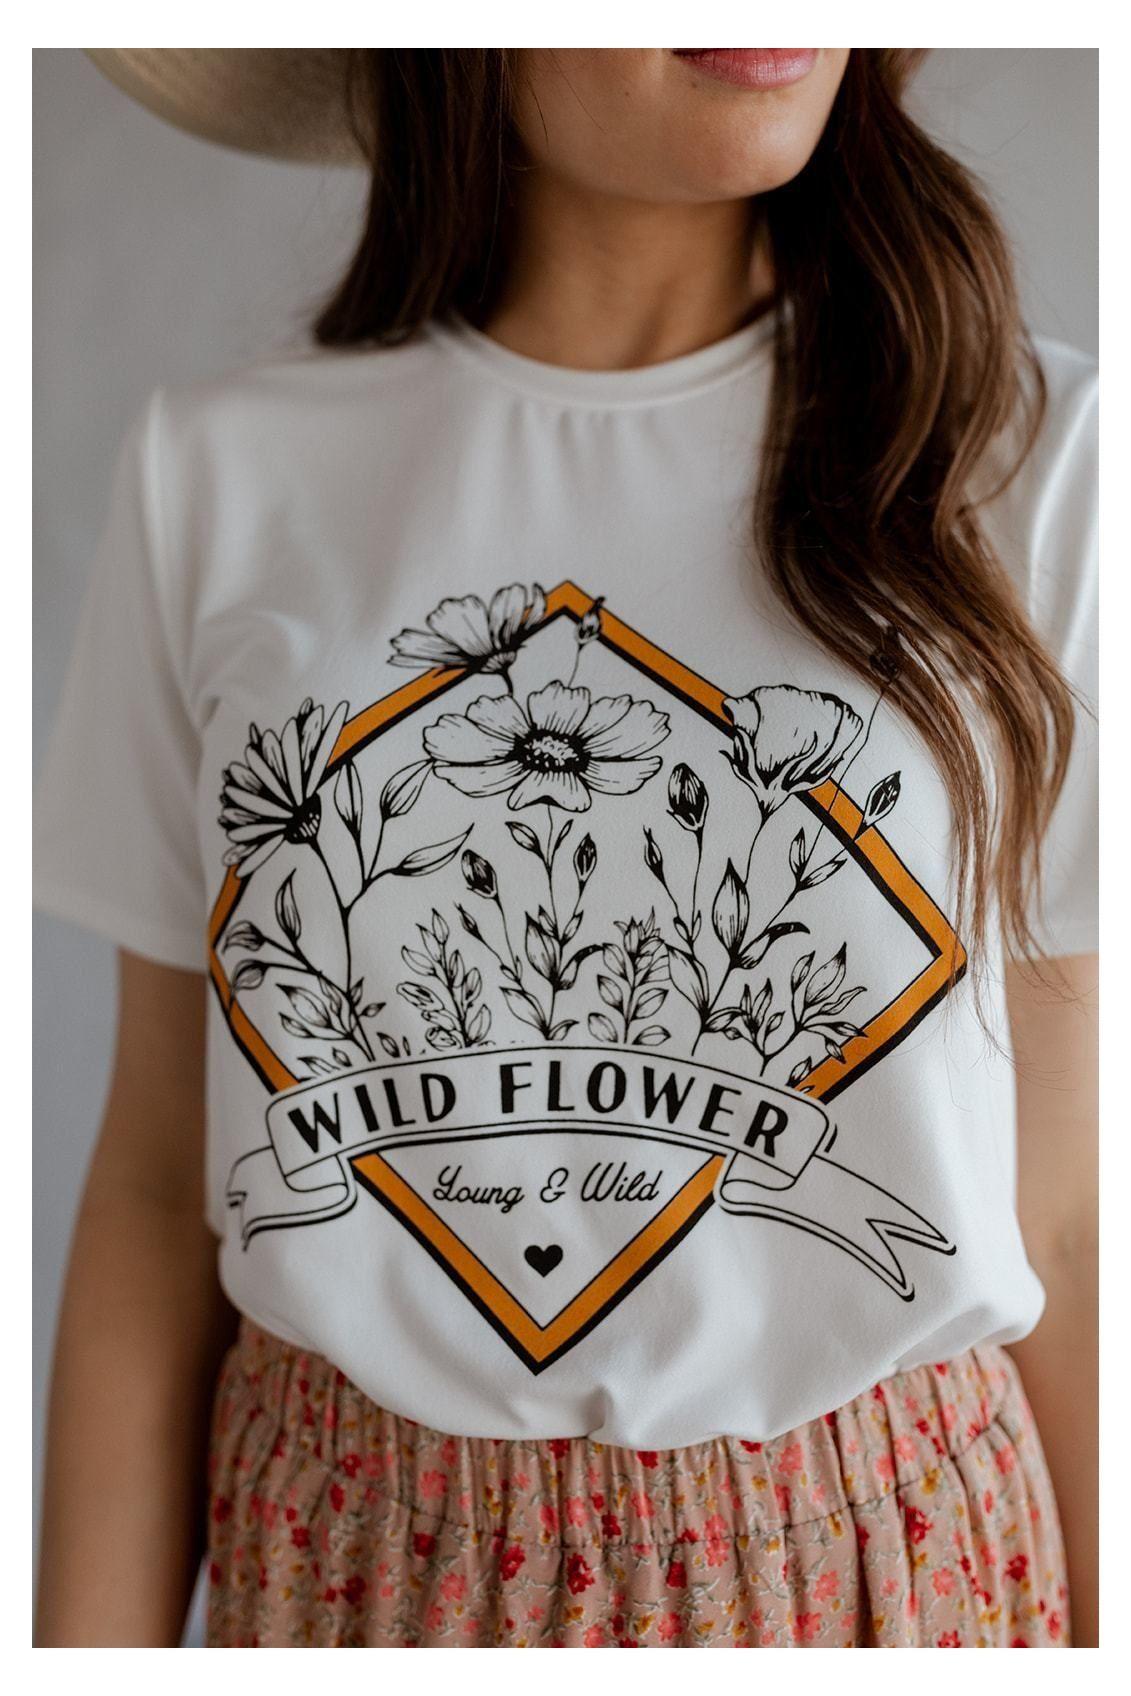 Happy flower design tee hand painted T-shirt oversize unisex shirt vintage style